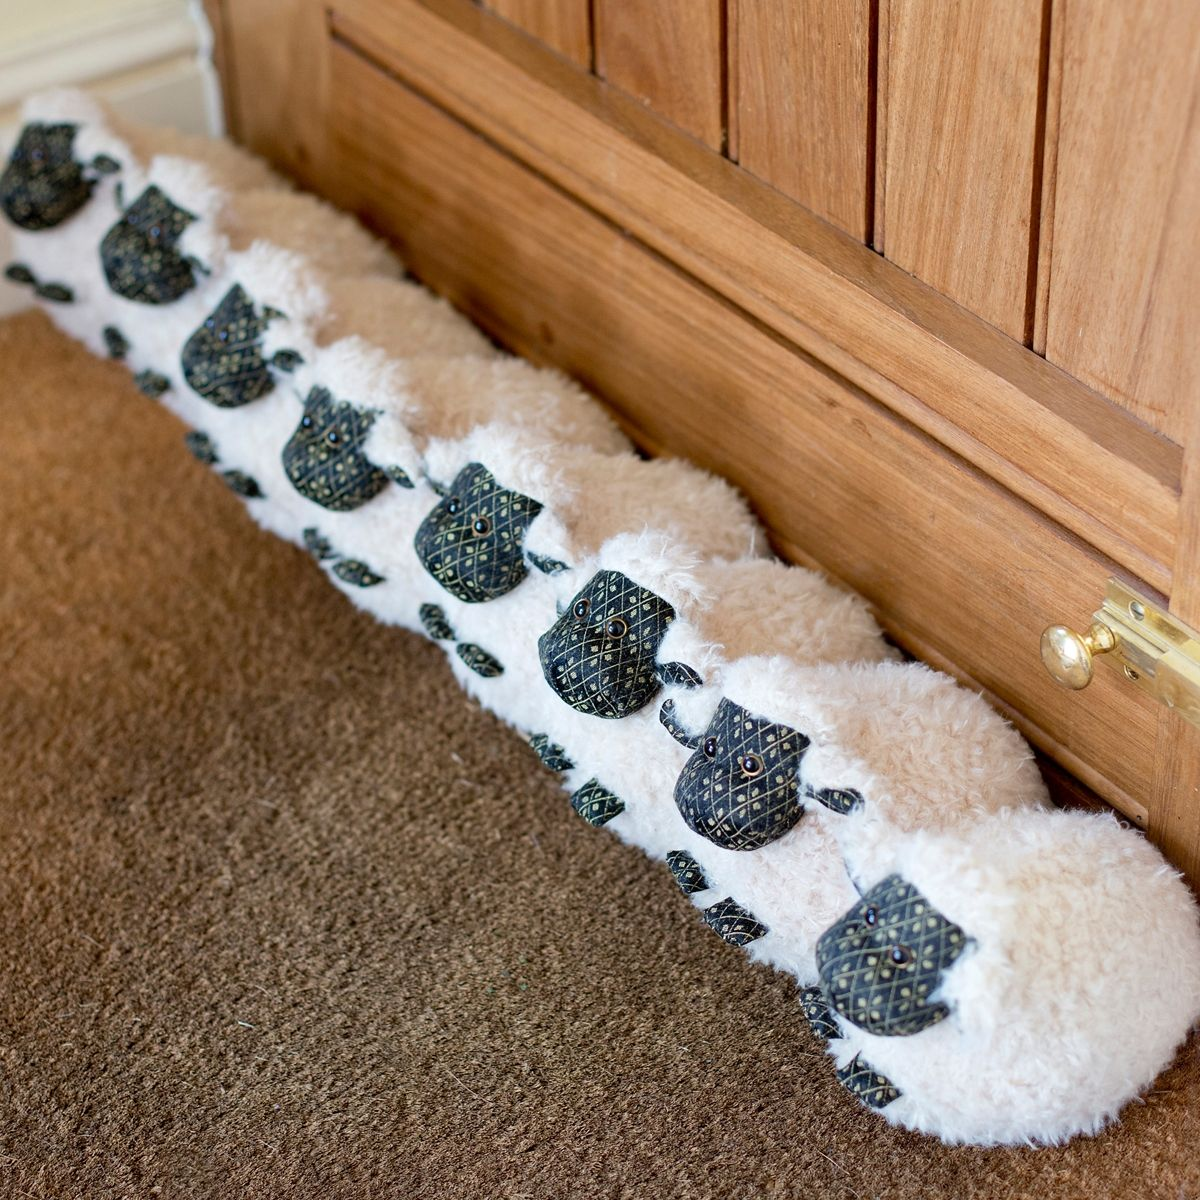 Woolly Sheep Draught Excluder Creative 2 Door Draft